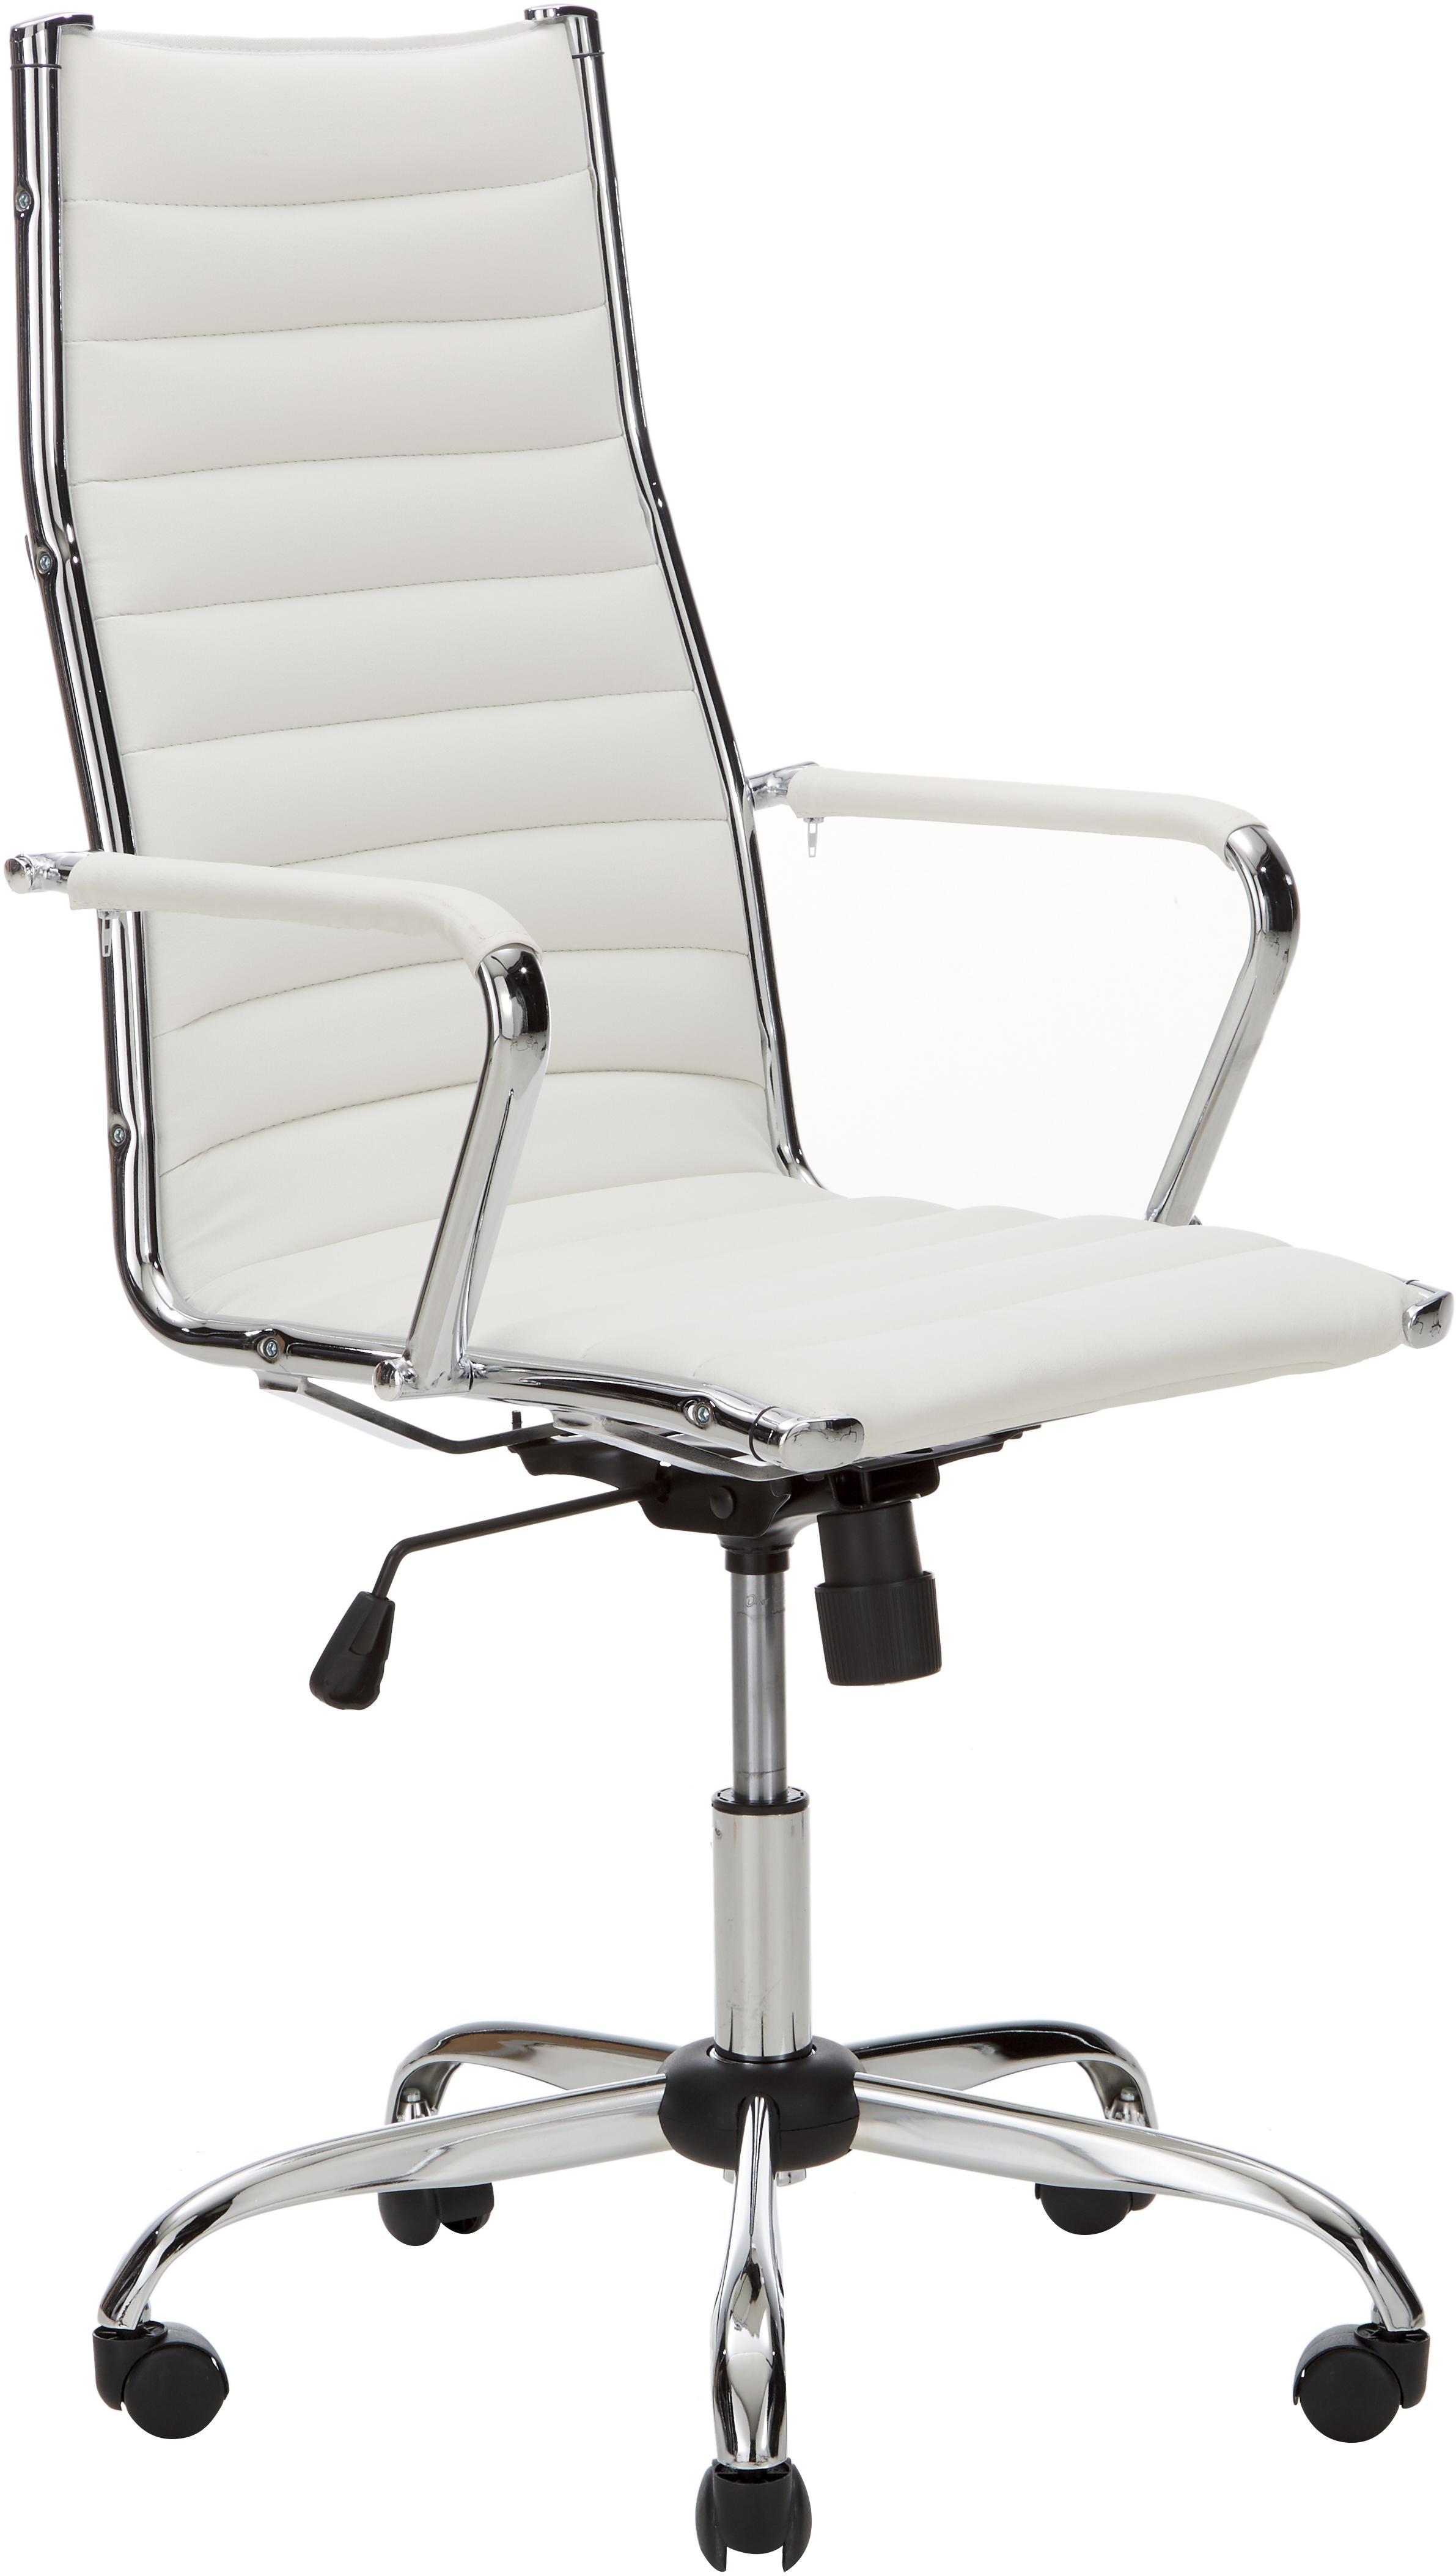 Silla giratoria de oficina Amstyle, altura regulable, Tapizado: cuero sintético, Estructura: metal cromado, Blanco, cromo, An 60 x F 62 cm